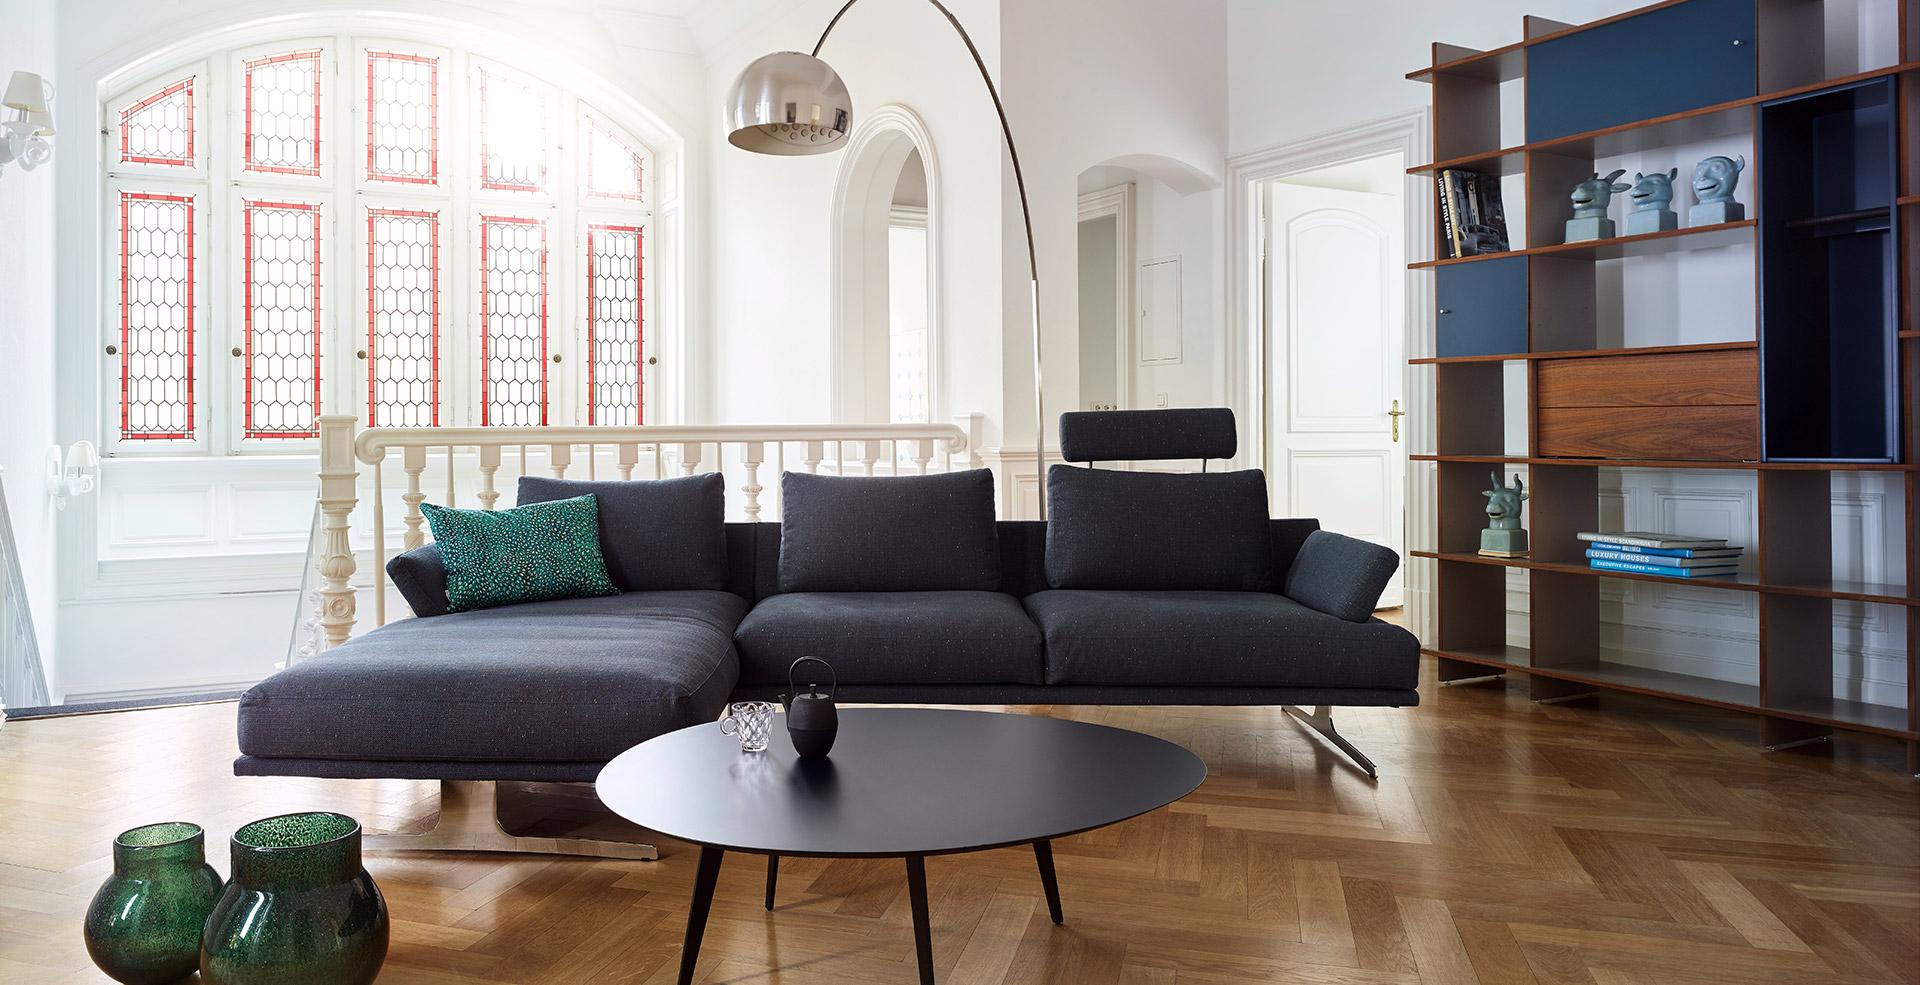 italienischer chic trifft altbau kontrast m bel leuchten accessoires. Black Bedroom Furniture Sets. Home Design Ideas